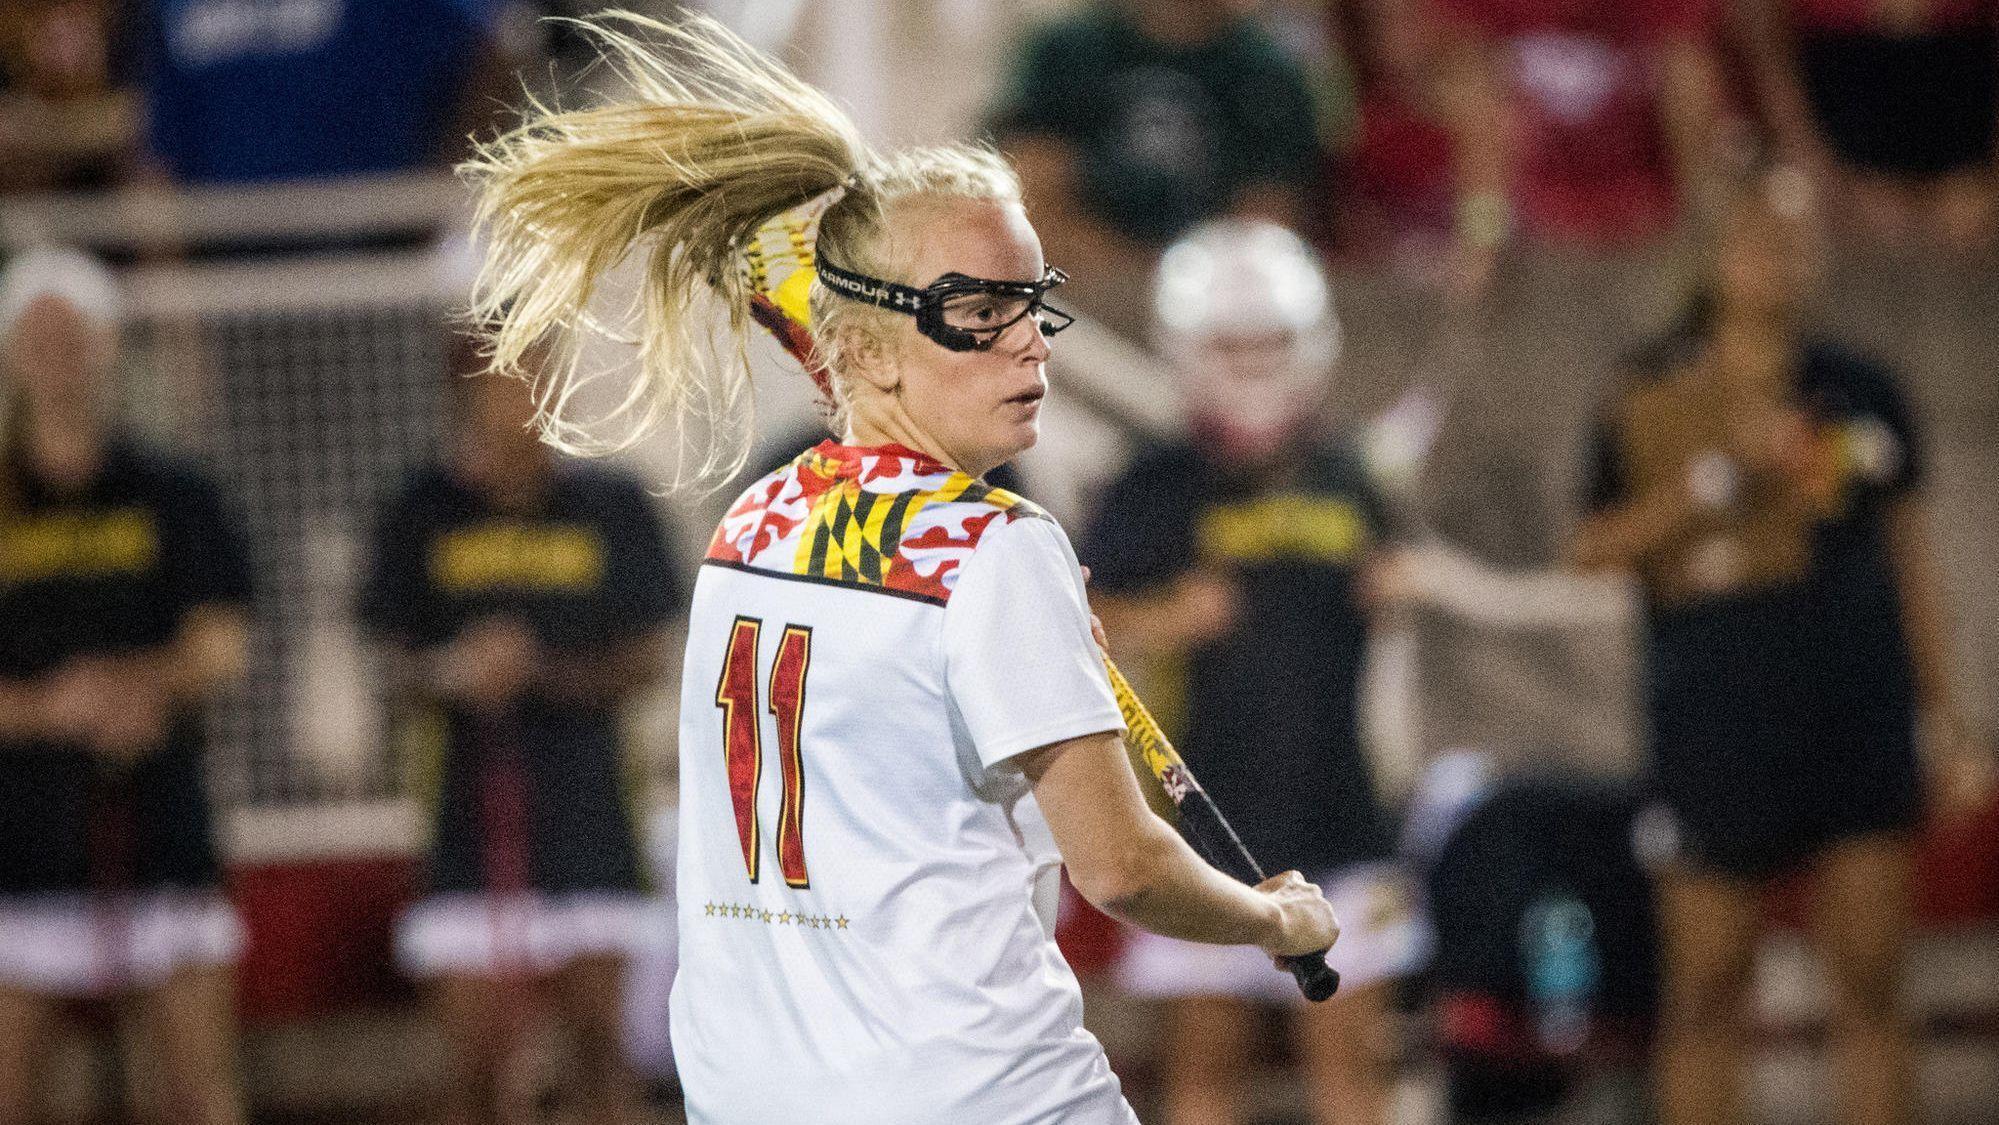 Steele overcomes injury, lifts No. 3 Maryland women's ...